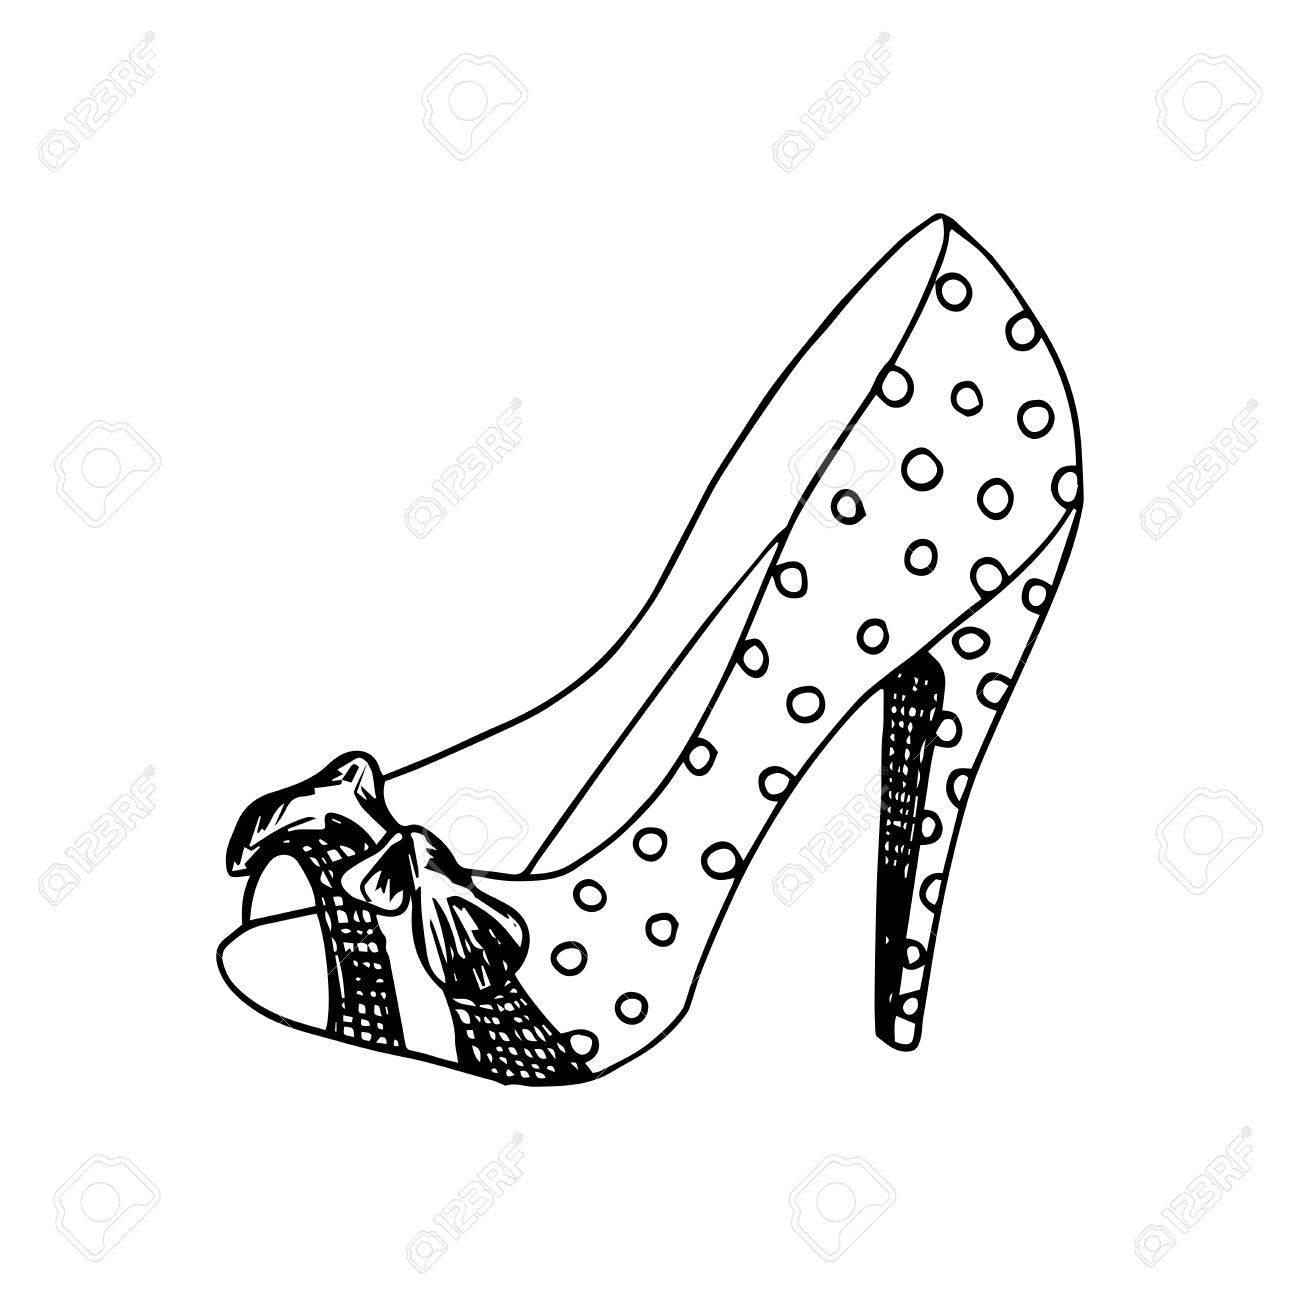 high heeled shoes for woman fashion footwear artwork isolated rh 123rf com Black Ladies Fashion Clip Art Fashion Girl Clip Art